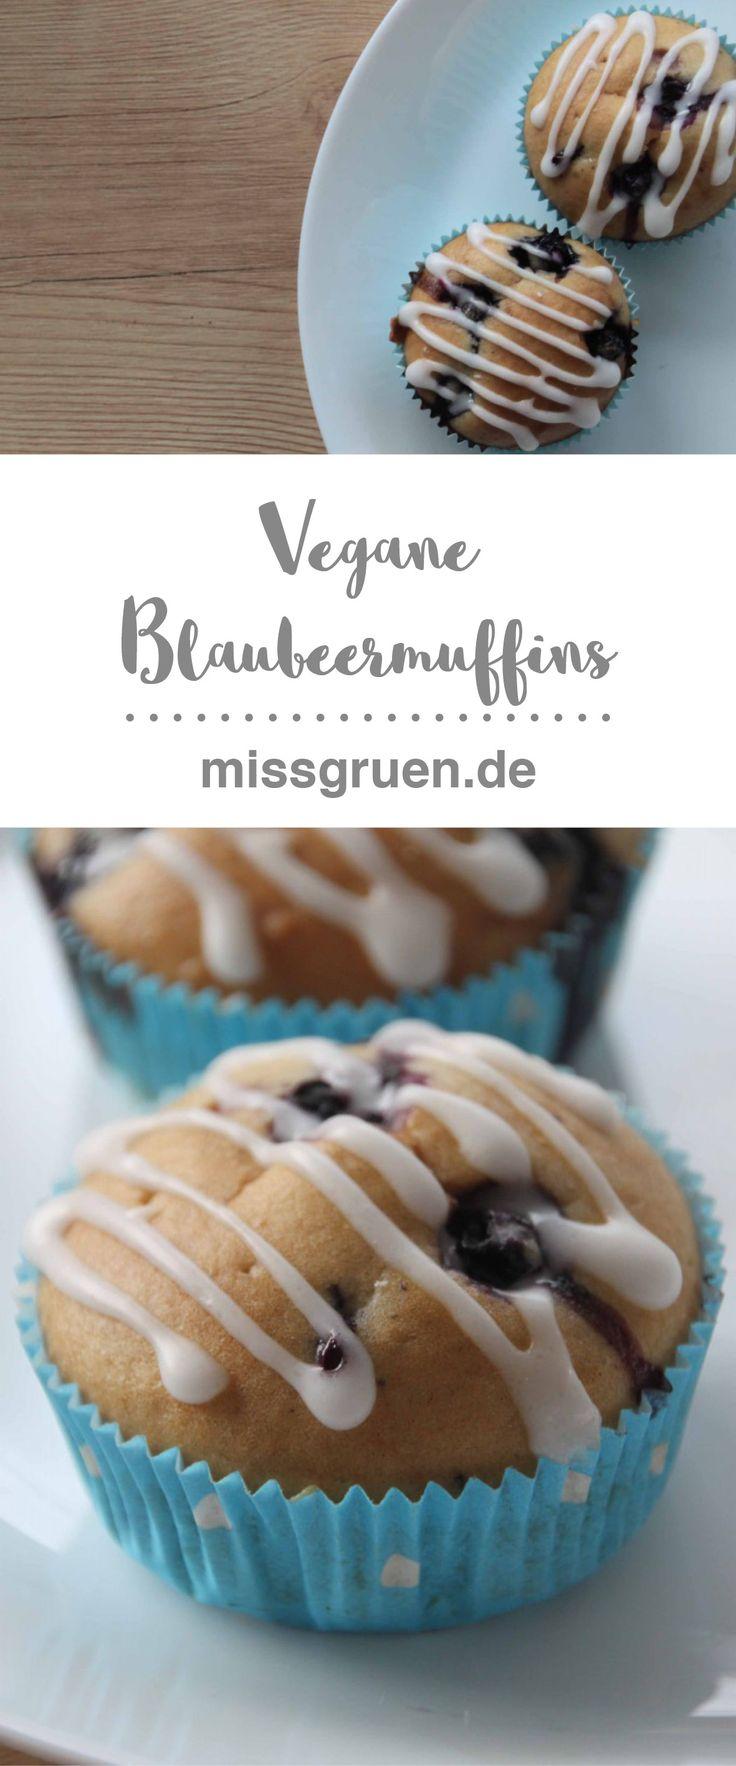 vegan Muffins, vegane, Blaubeeren, Blaubeermuffins, cupcakes, blueberry, vegan cupcakes, recipe, rezept, baking, soulfood, treat